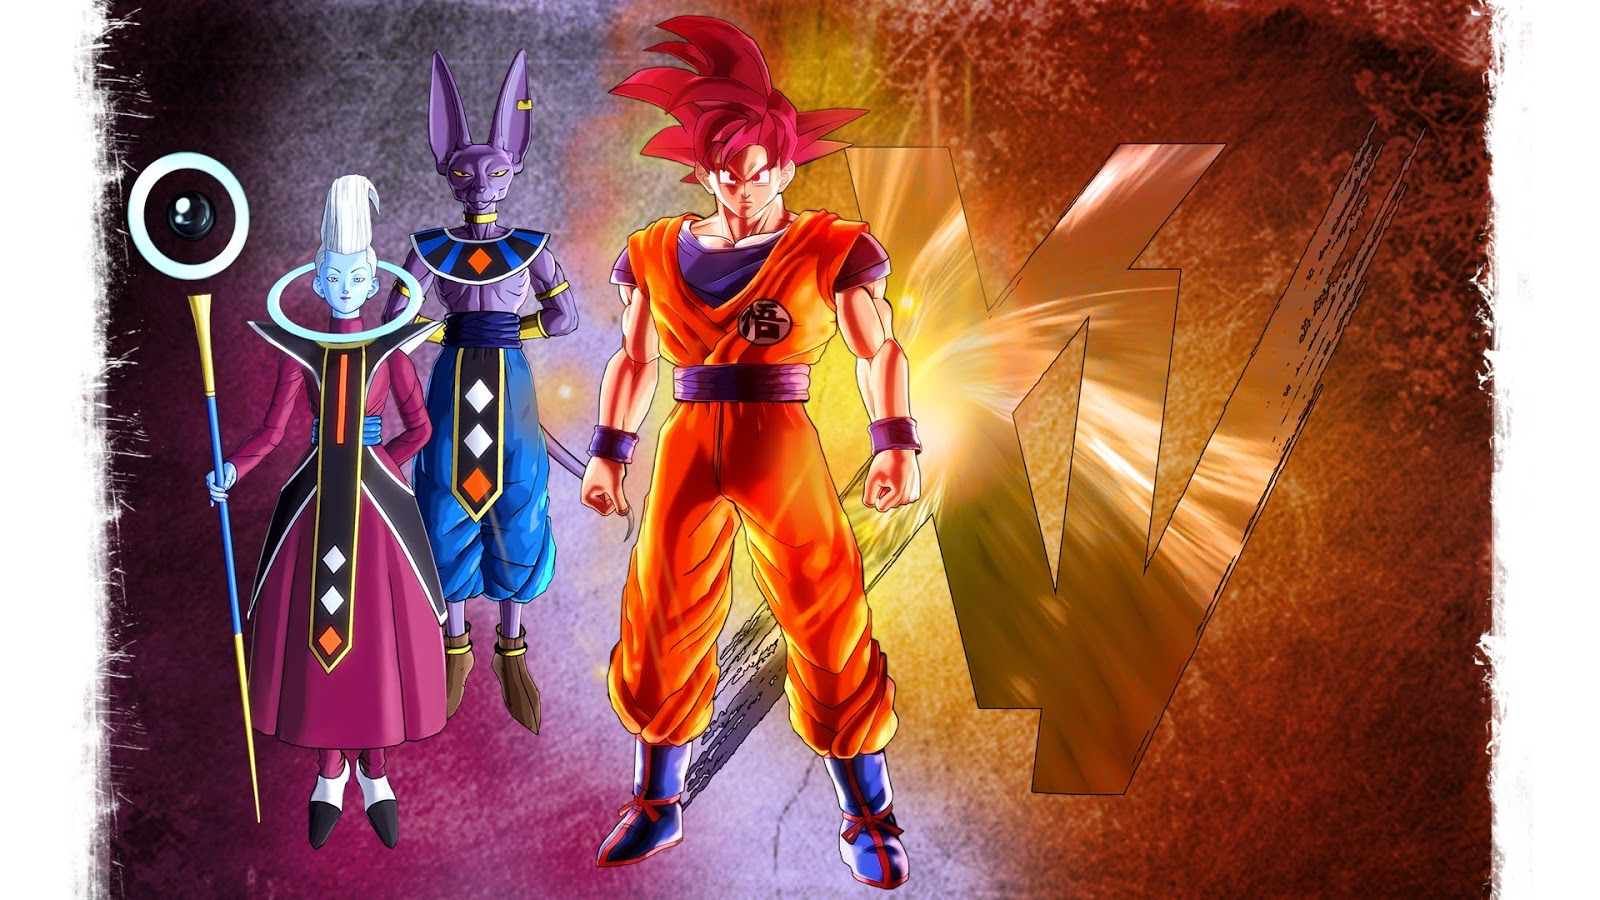 Dragon Ball HD Wallpaper Pack